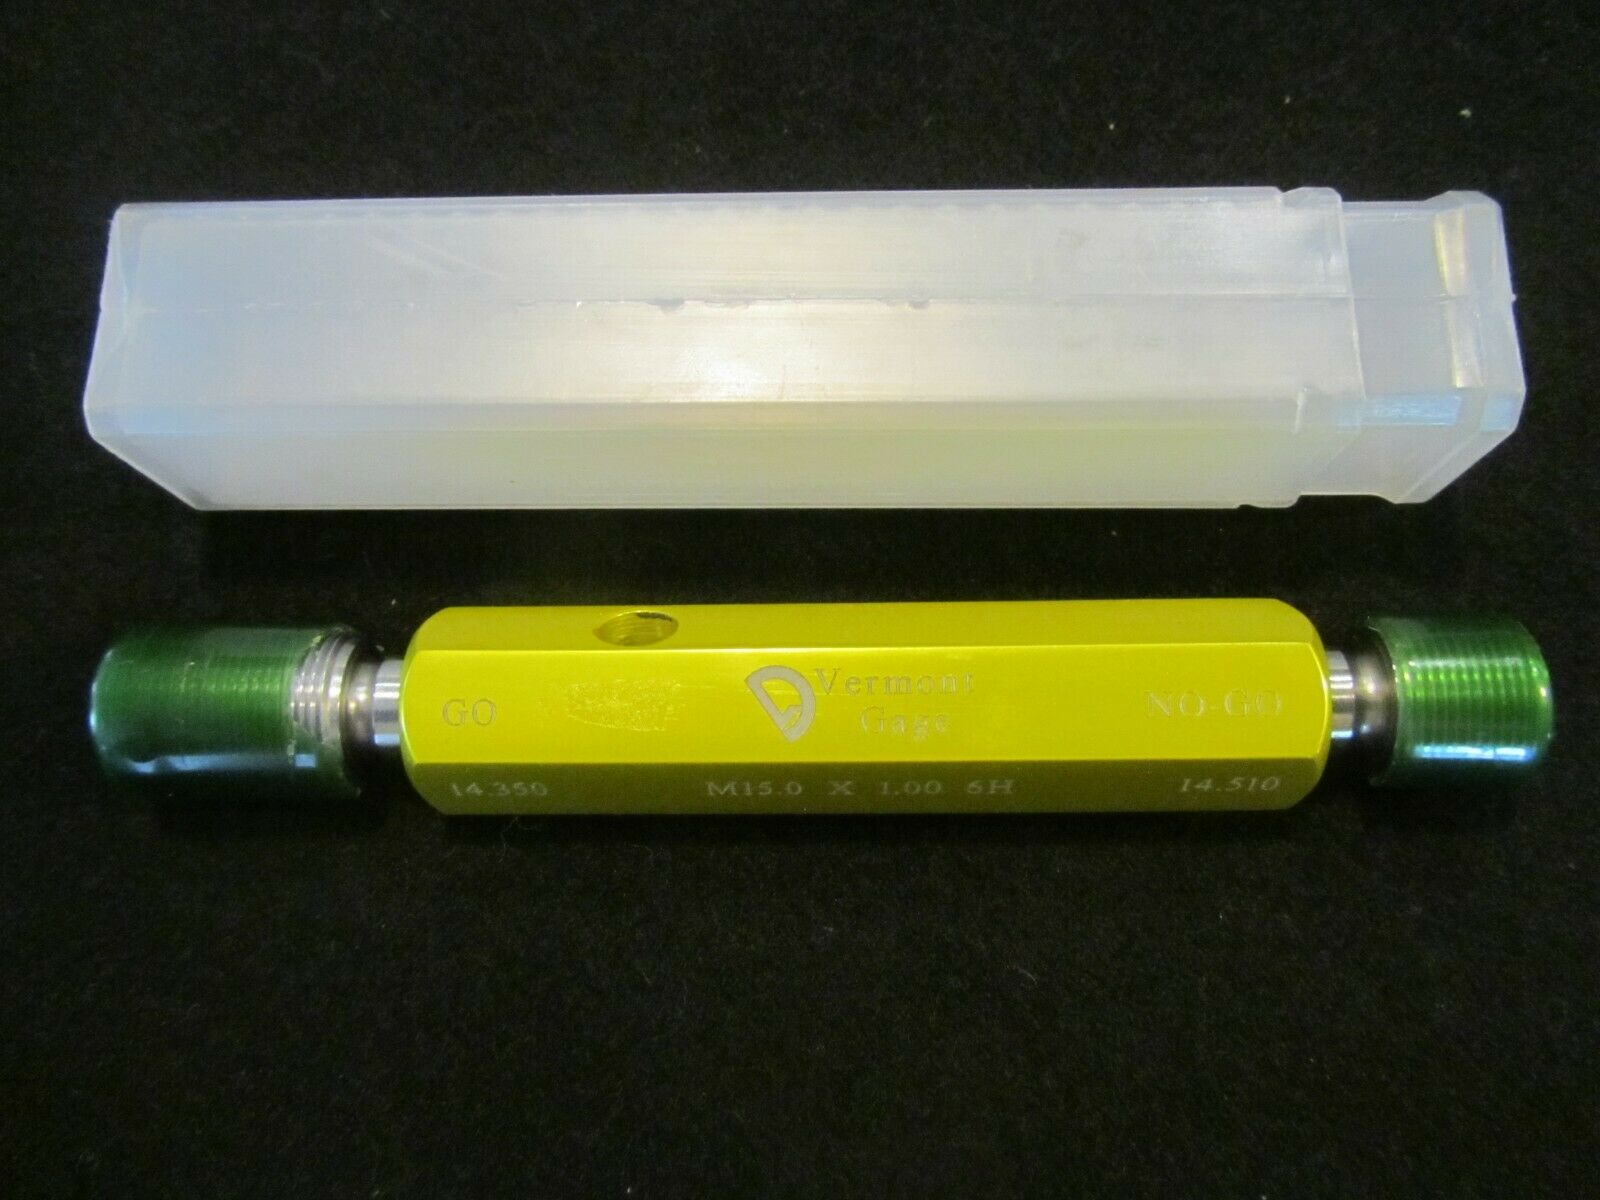 M10 X 1 6H Metric Thread Plug GAGE 10.0 1.0 GO NO GO P.D.S = 9.350 /& 9.500 1.00